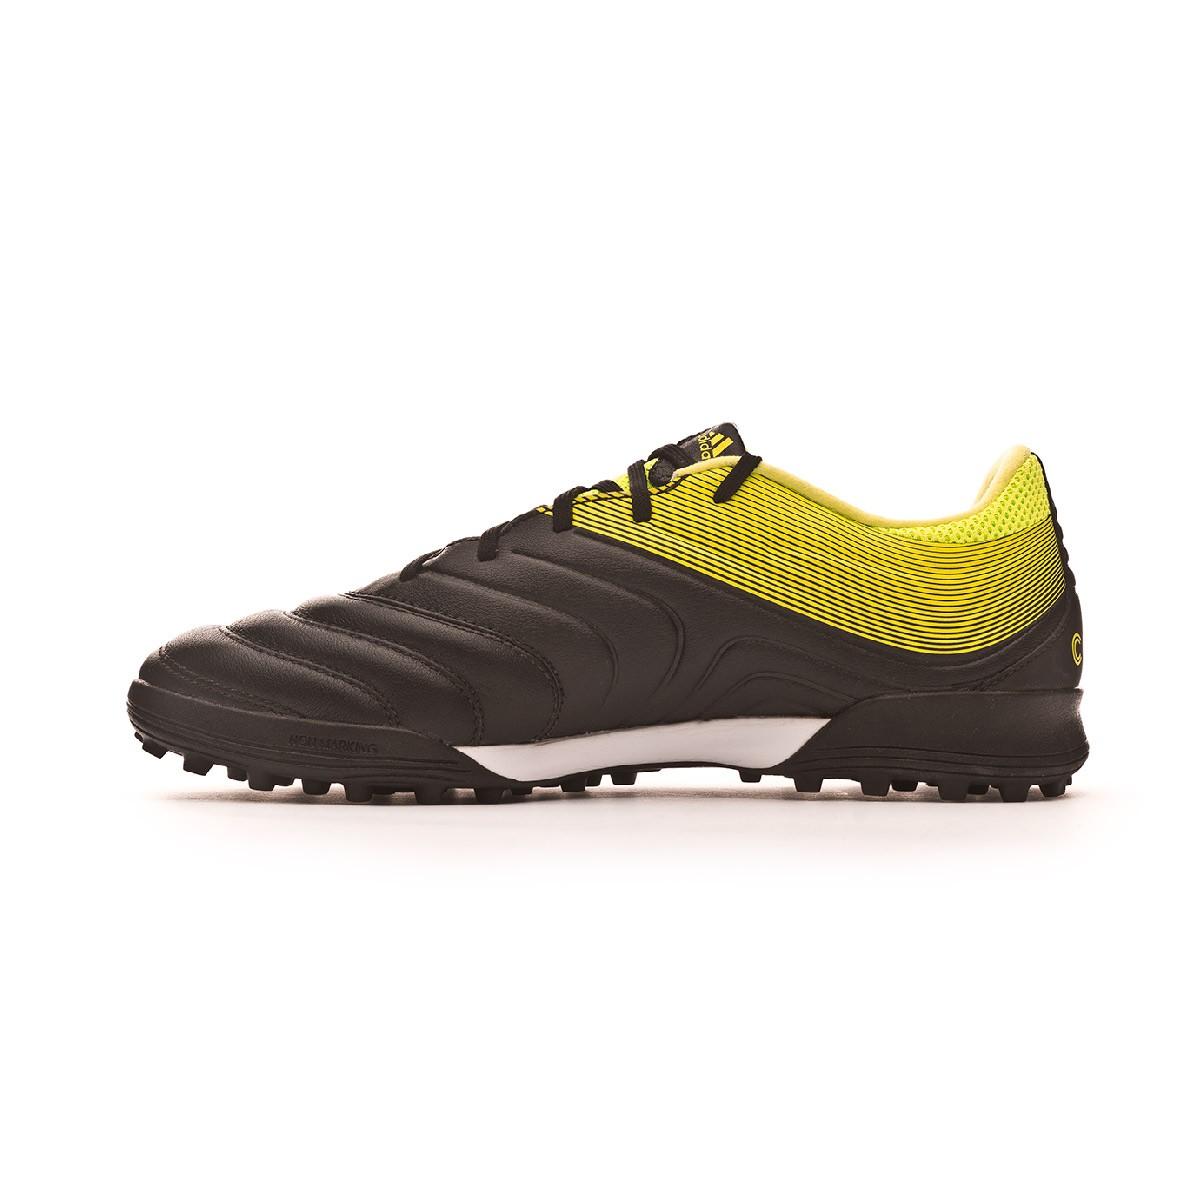 9776c3ee7 Football Boot adidas Copa Tango 19.3 Turf Core black-Solar yellow-Core black  - Tienda de fútbol Fútbol Emotion